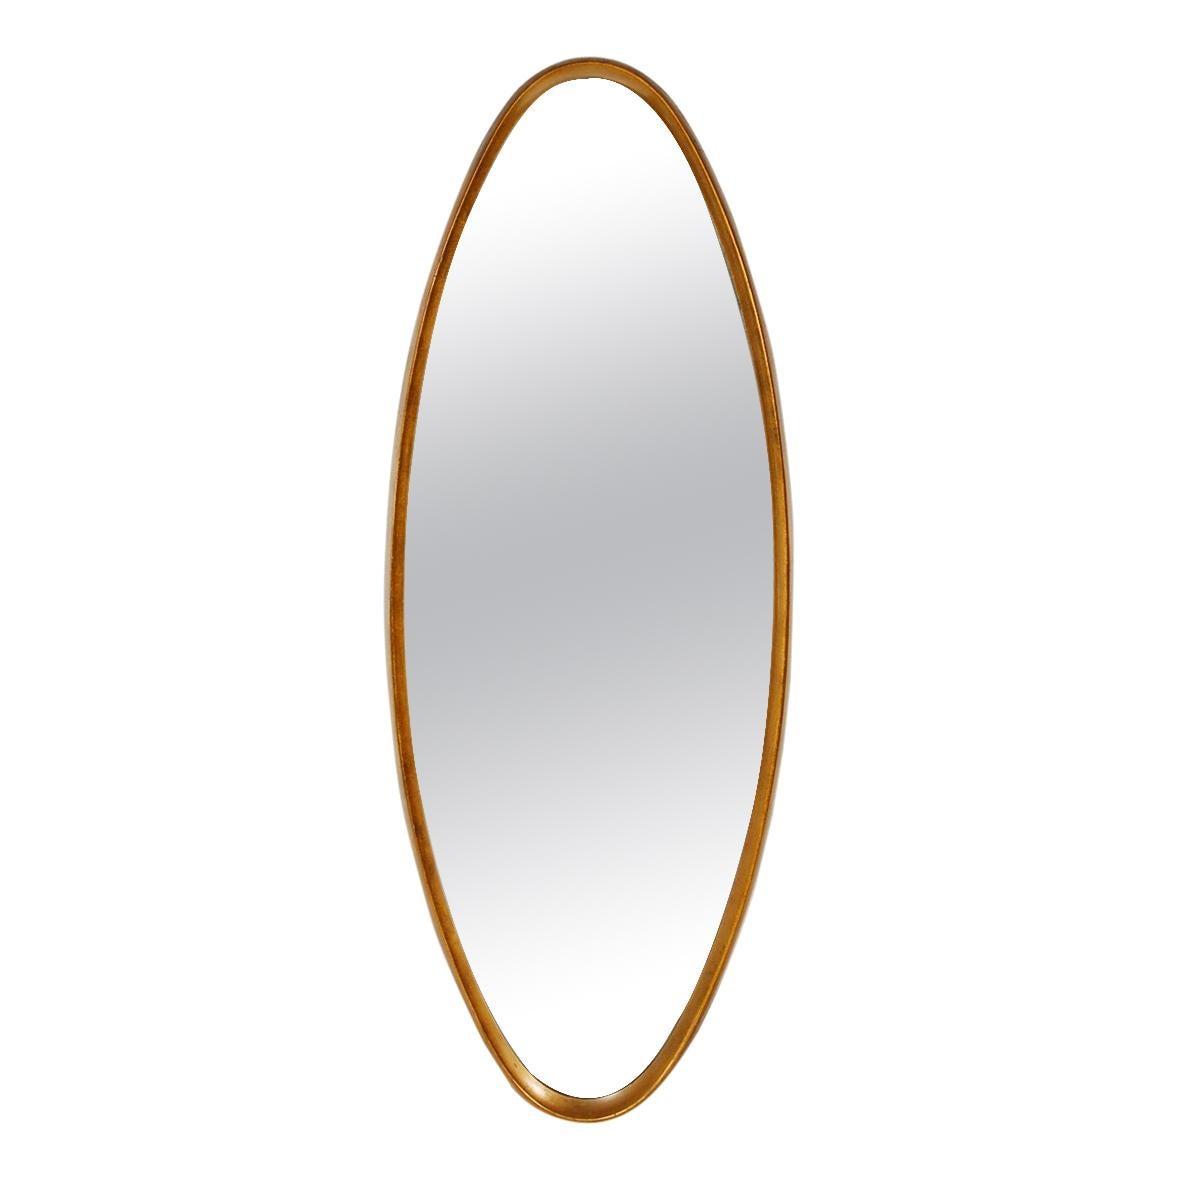 Hollywood Regency Italian Gold Giltwood Frame Oval Wall Mirror